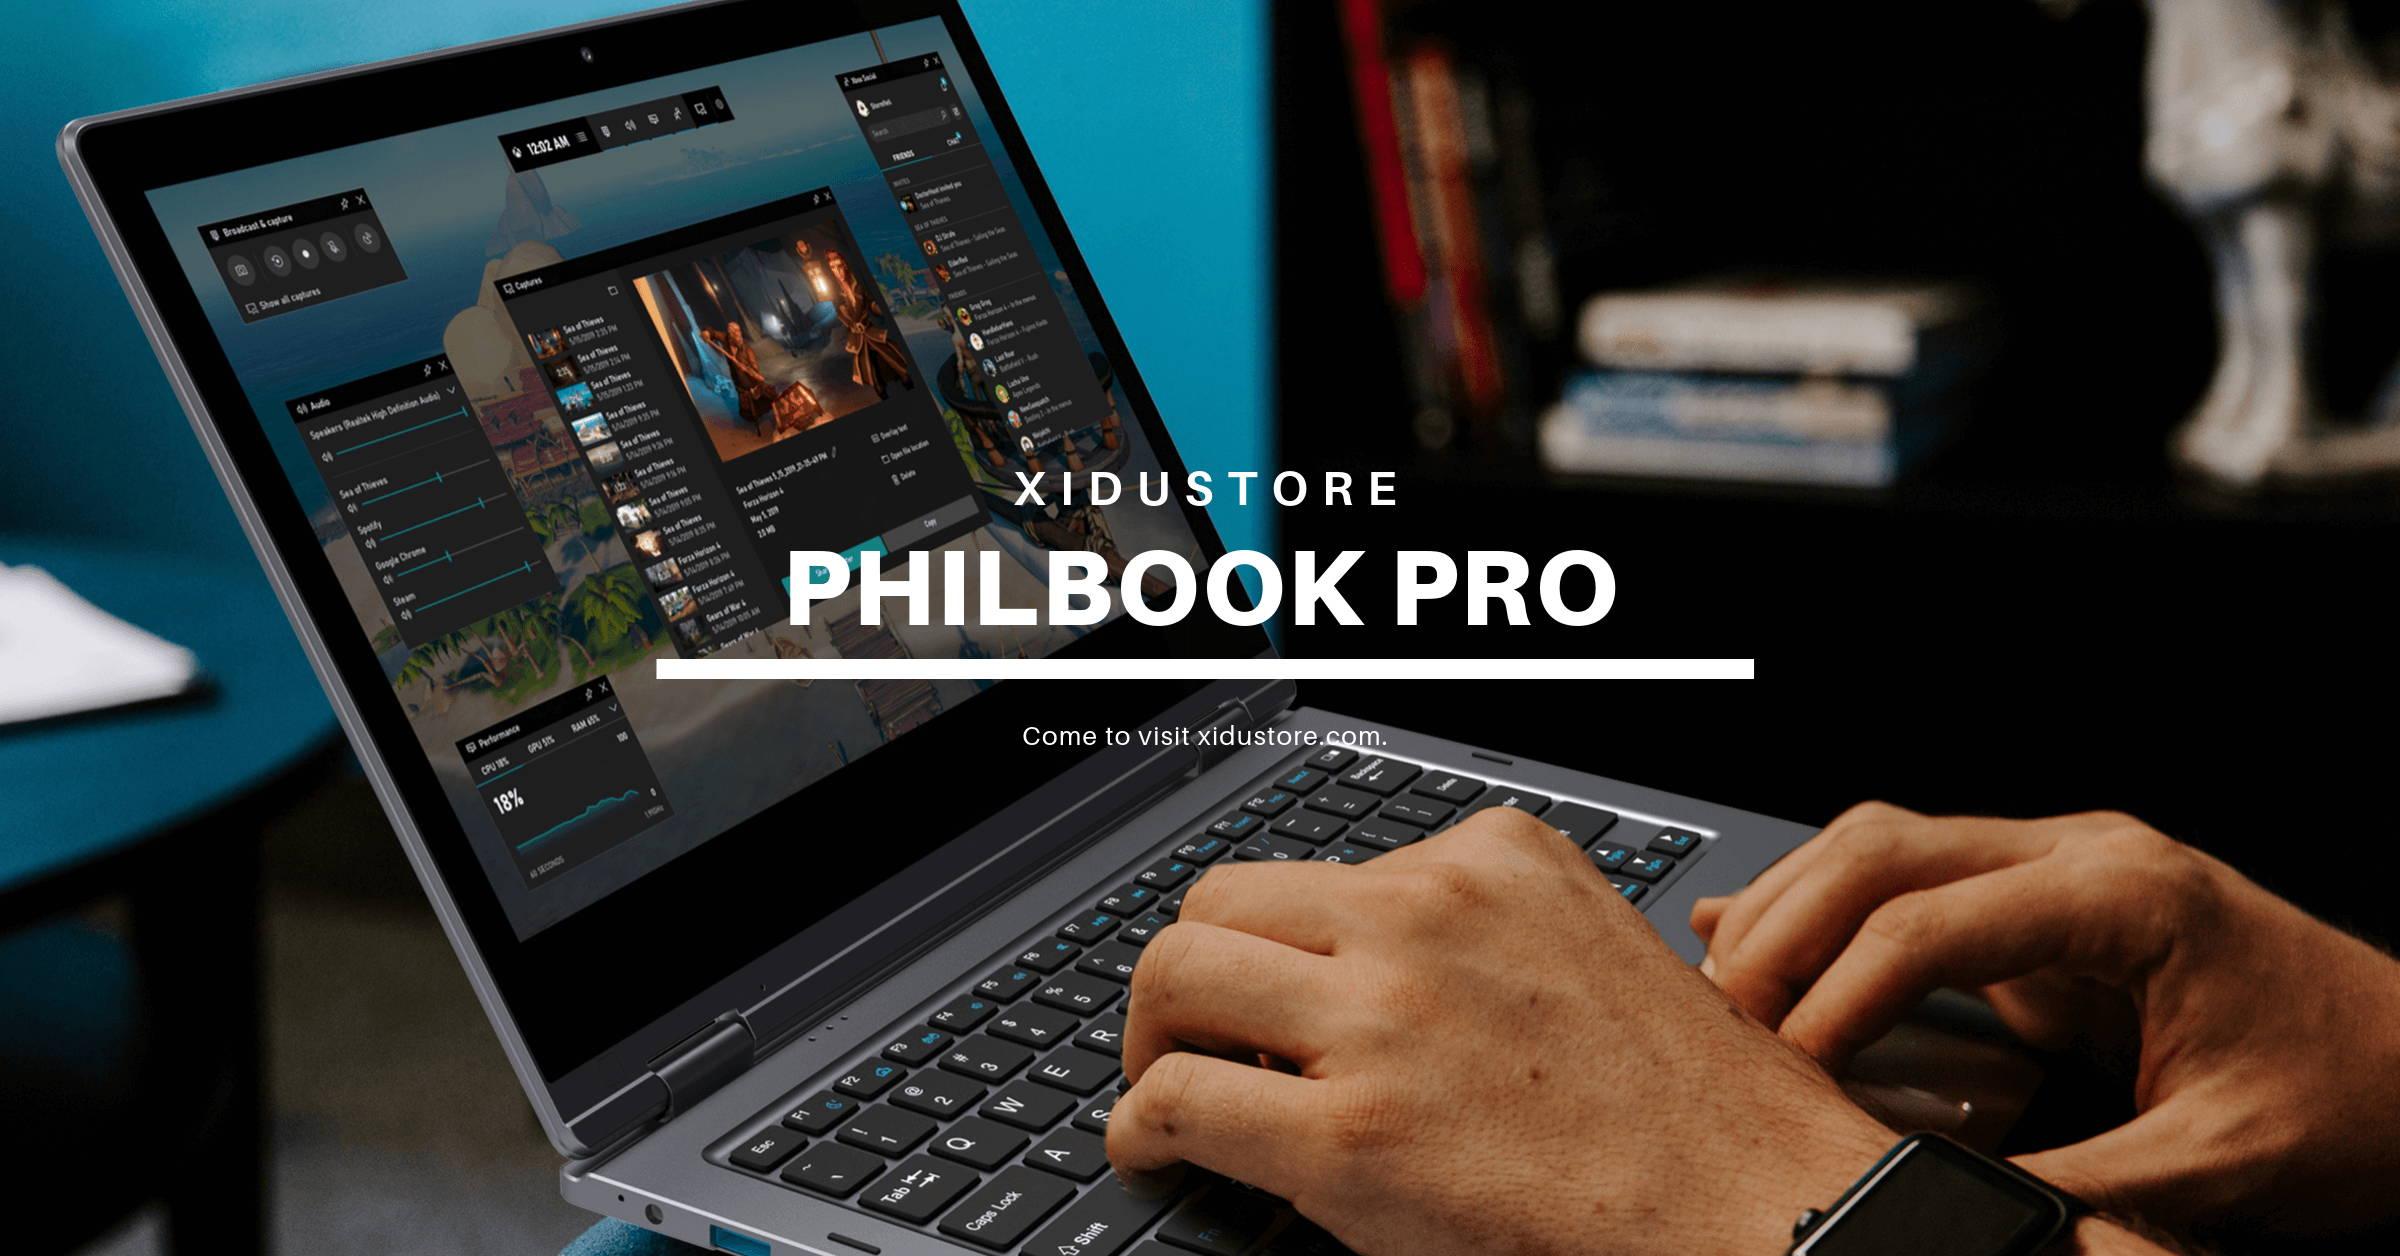 philbookpro